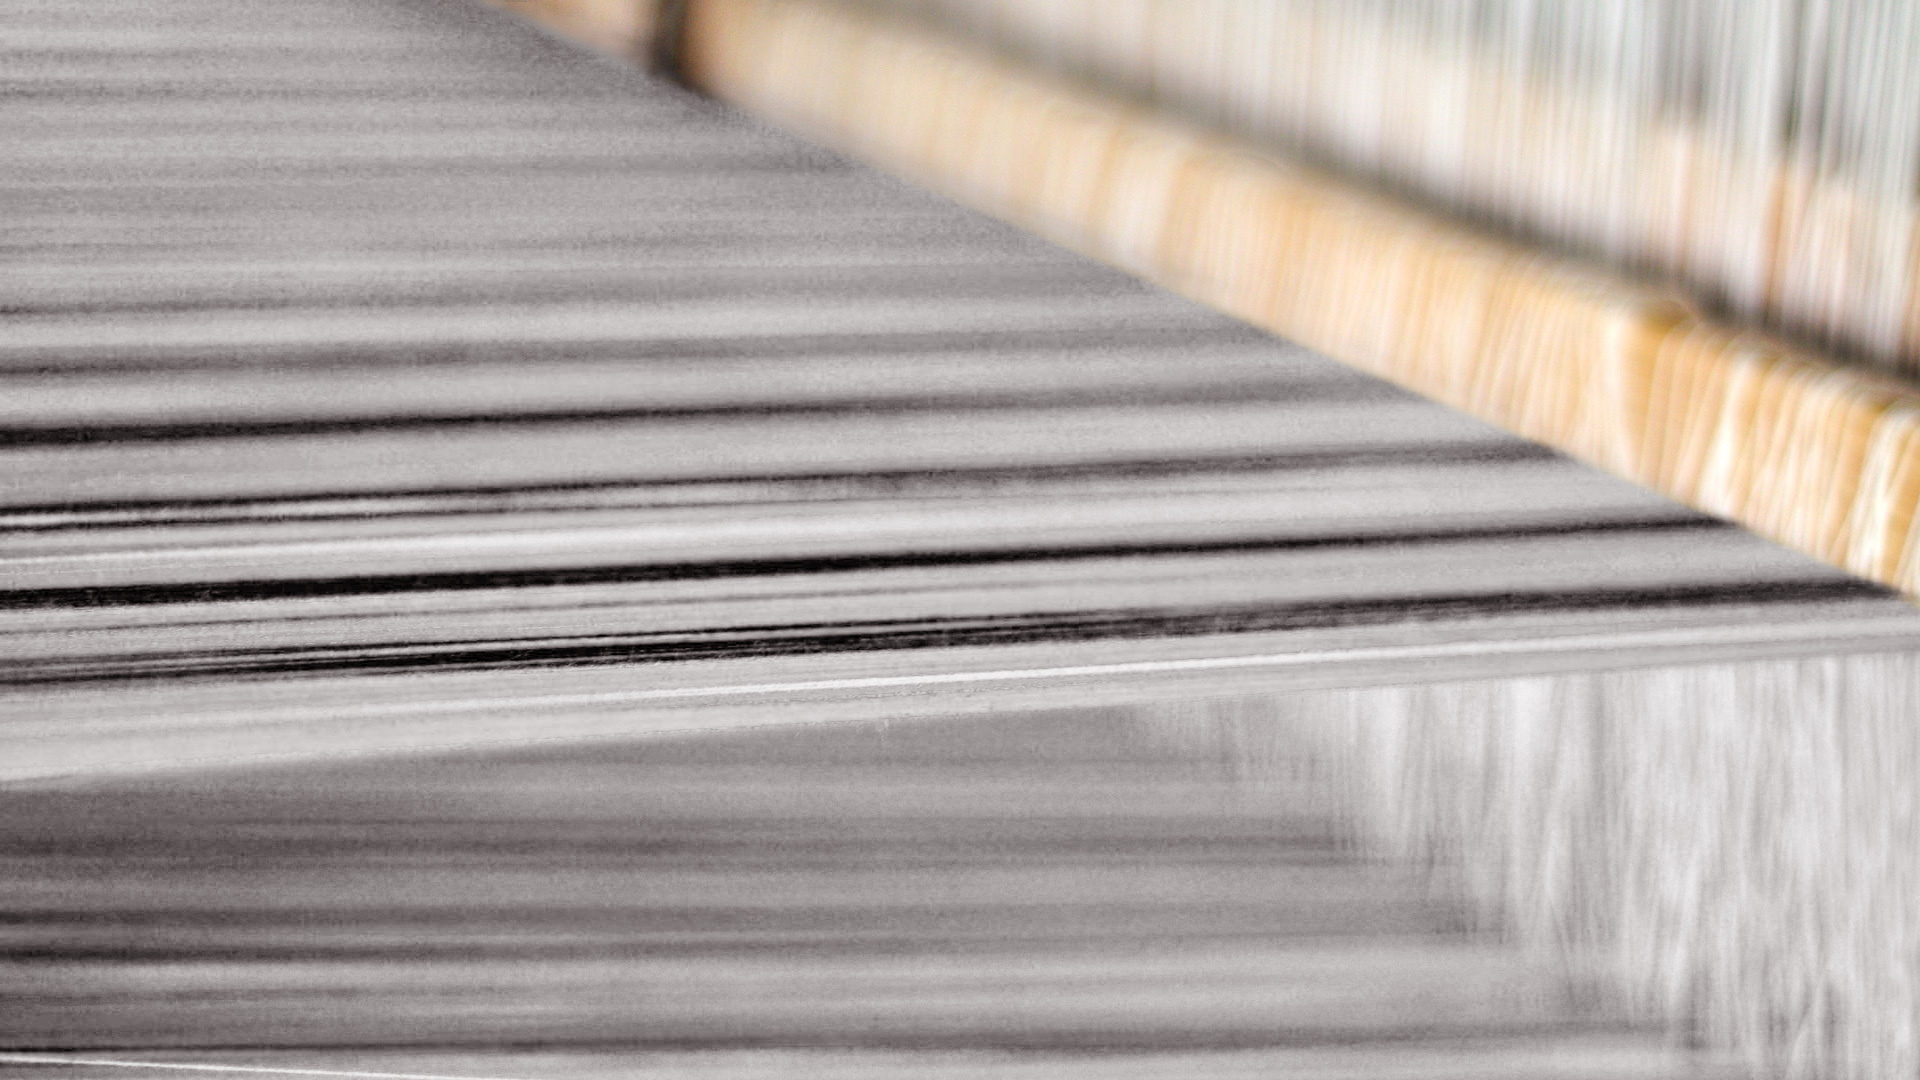 NMMO纯物理纺丝工艺<br/>无毒无污+99%绿色循环